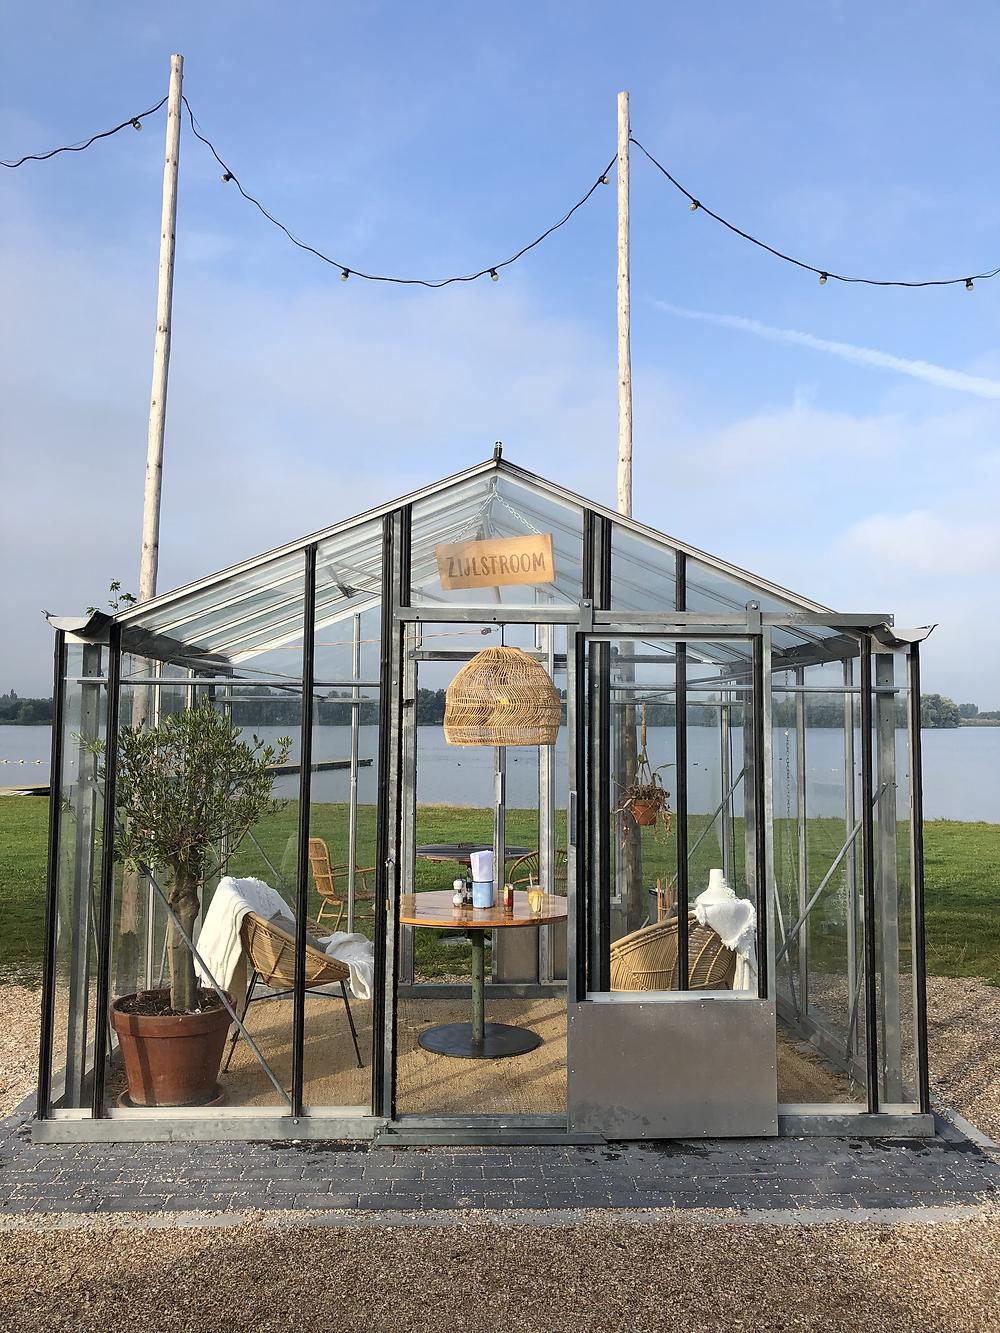 Greenhouse at Brasserie Buitenhuis Leiden